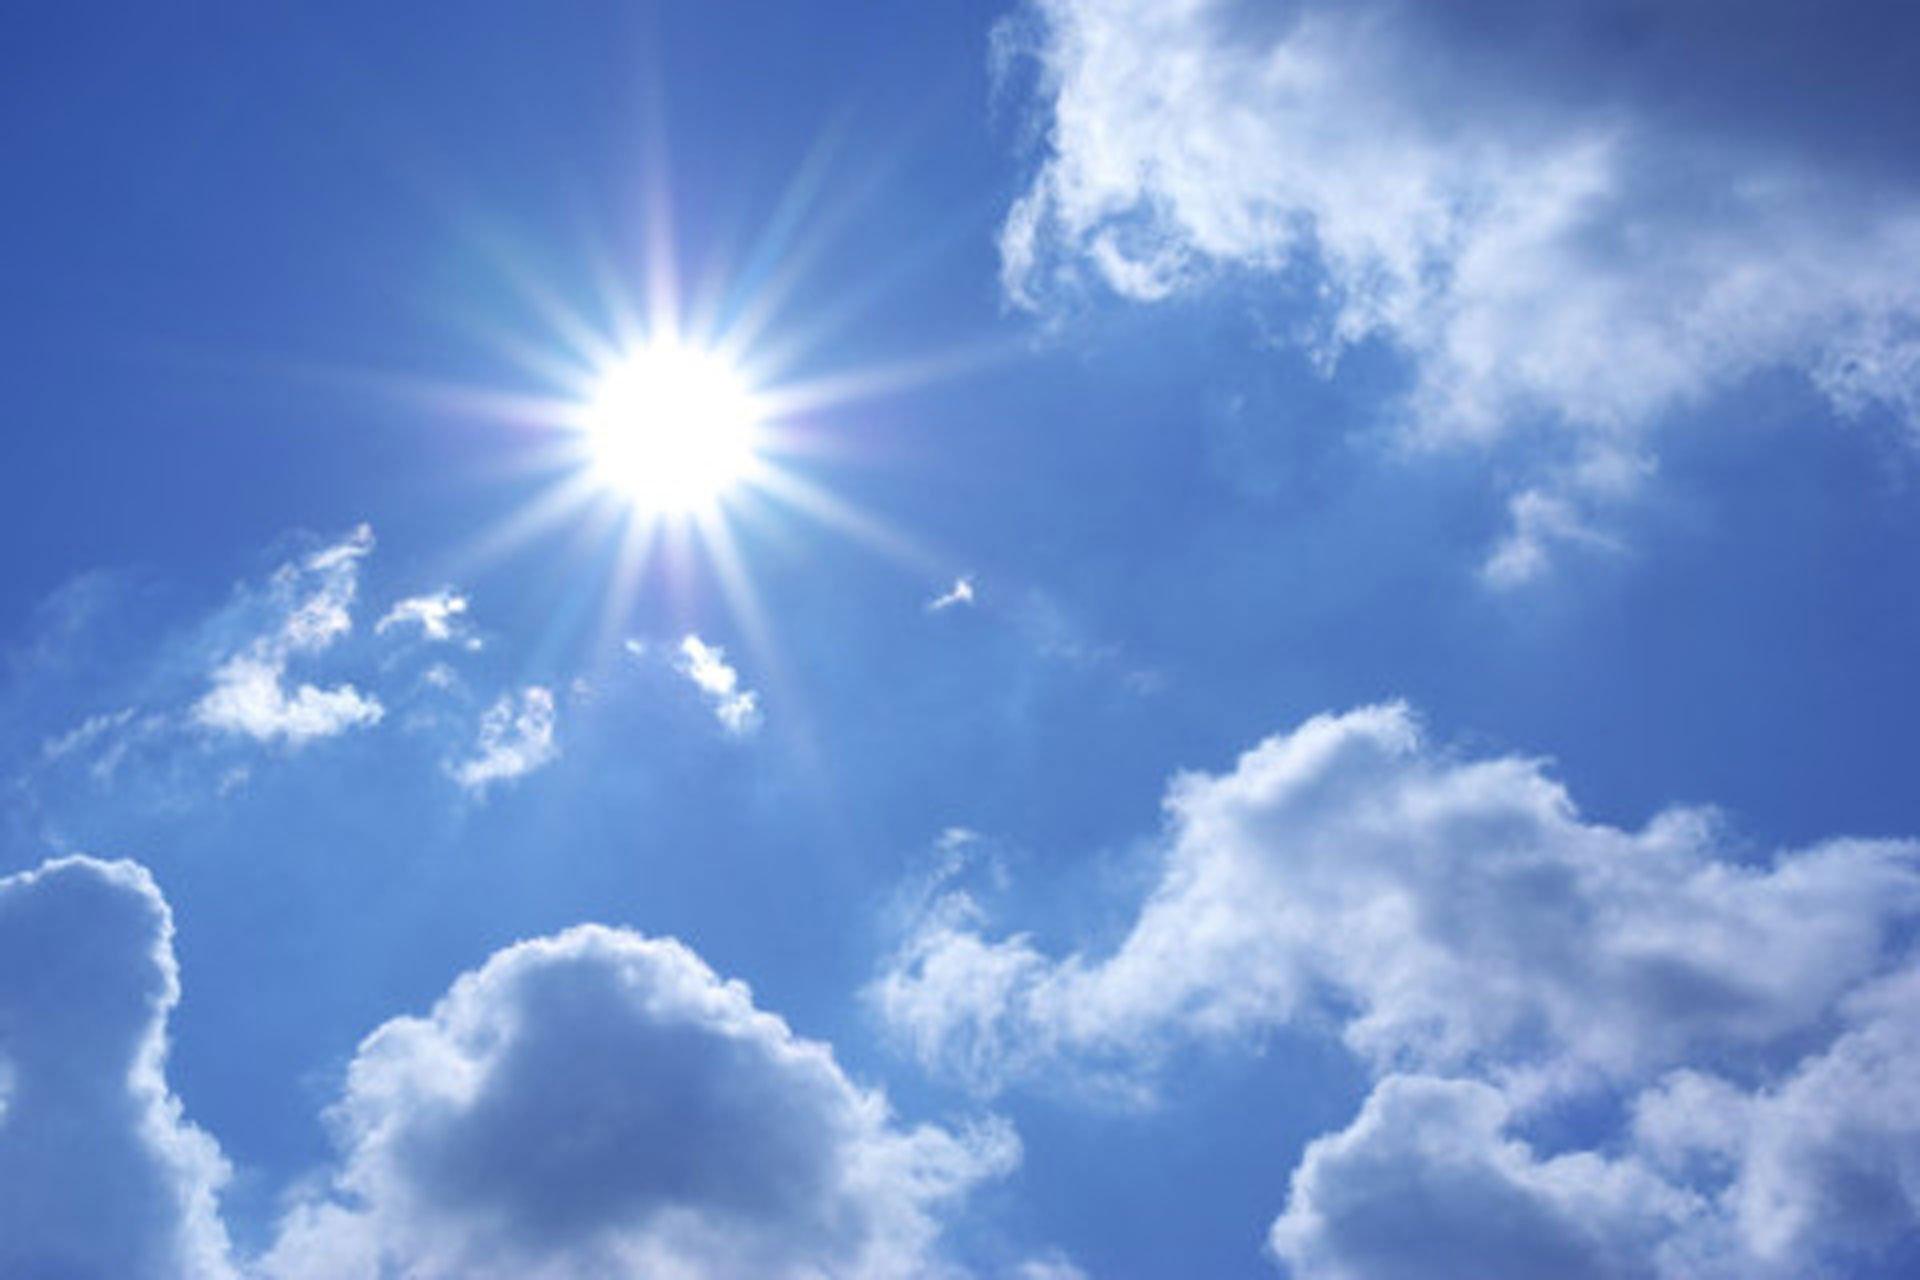 U BiH sunčano, dnevna temperatura na jugu do 31 stepen